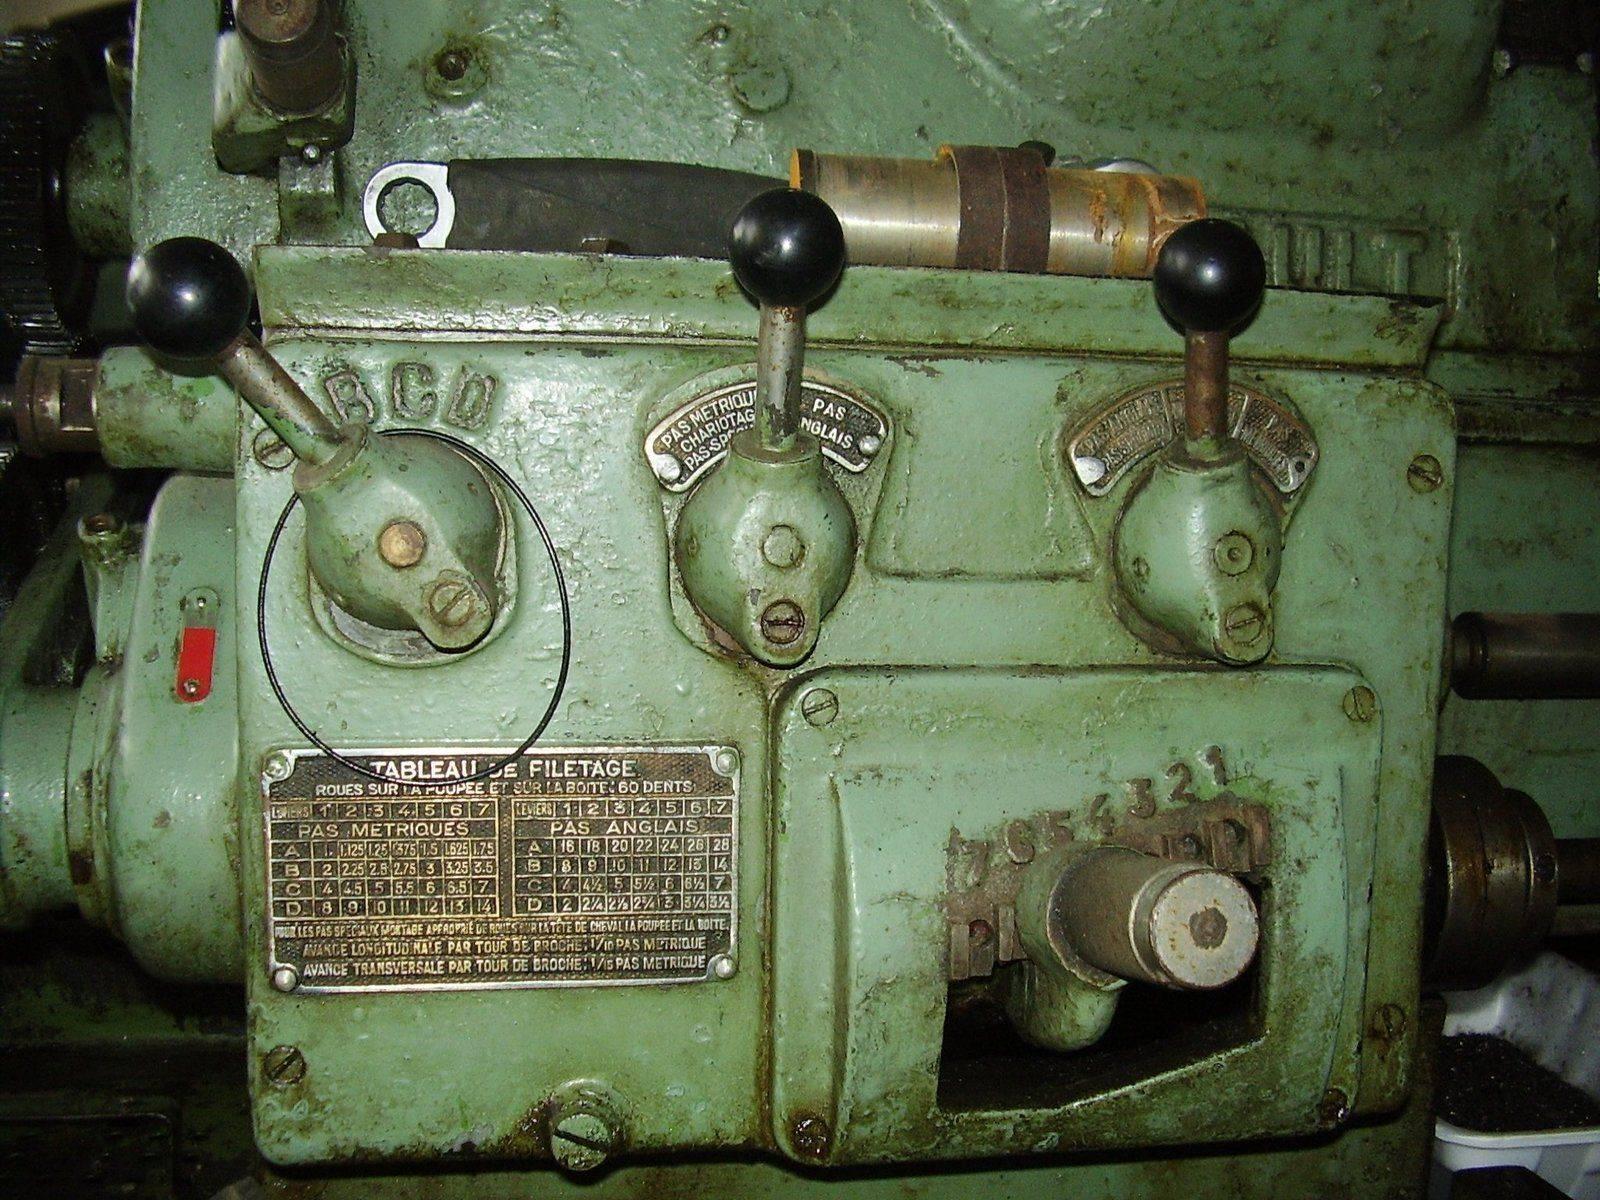 PC280246.JPG